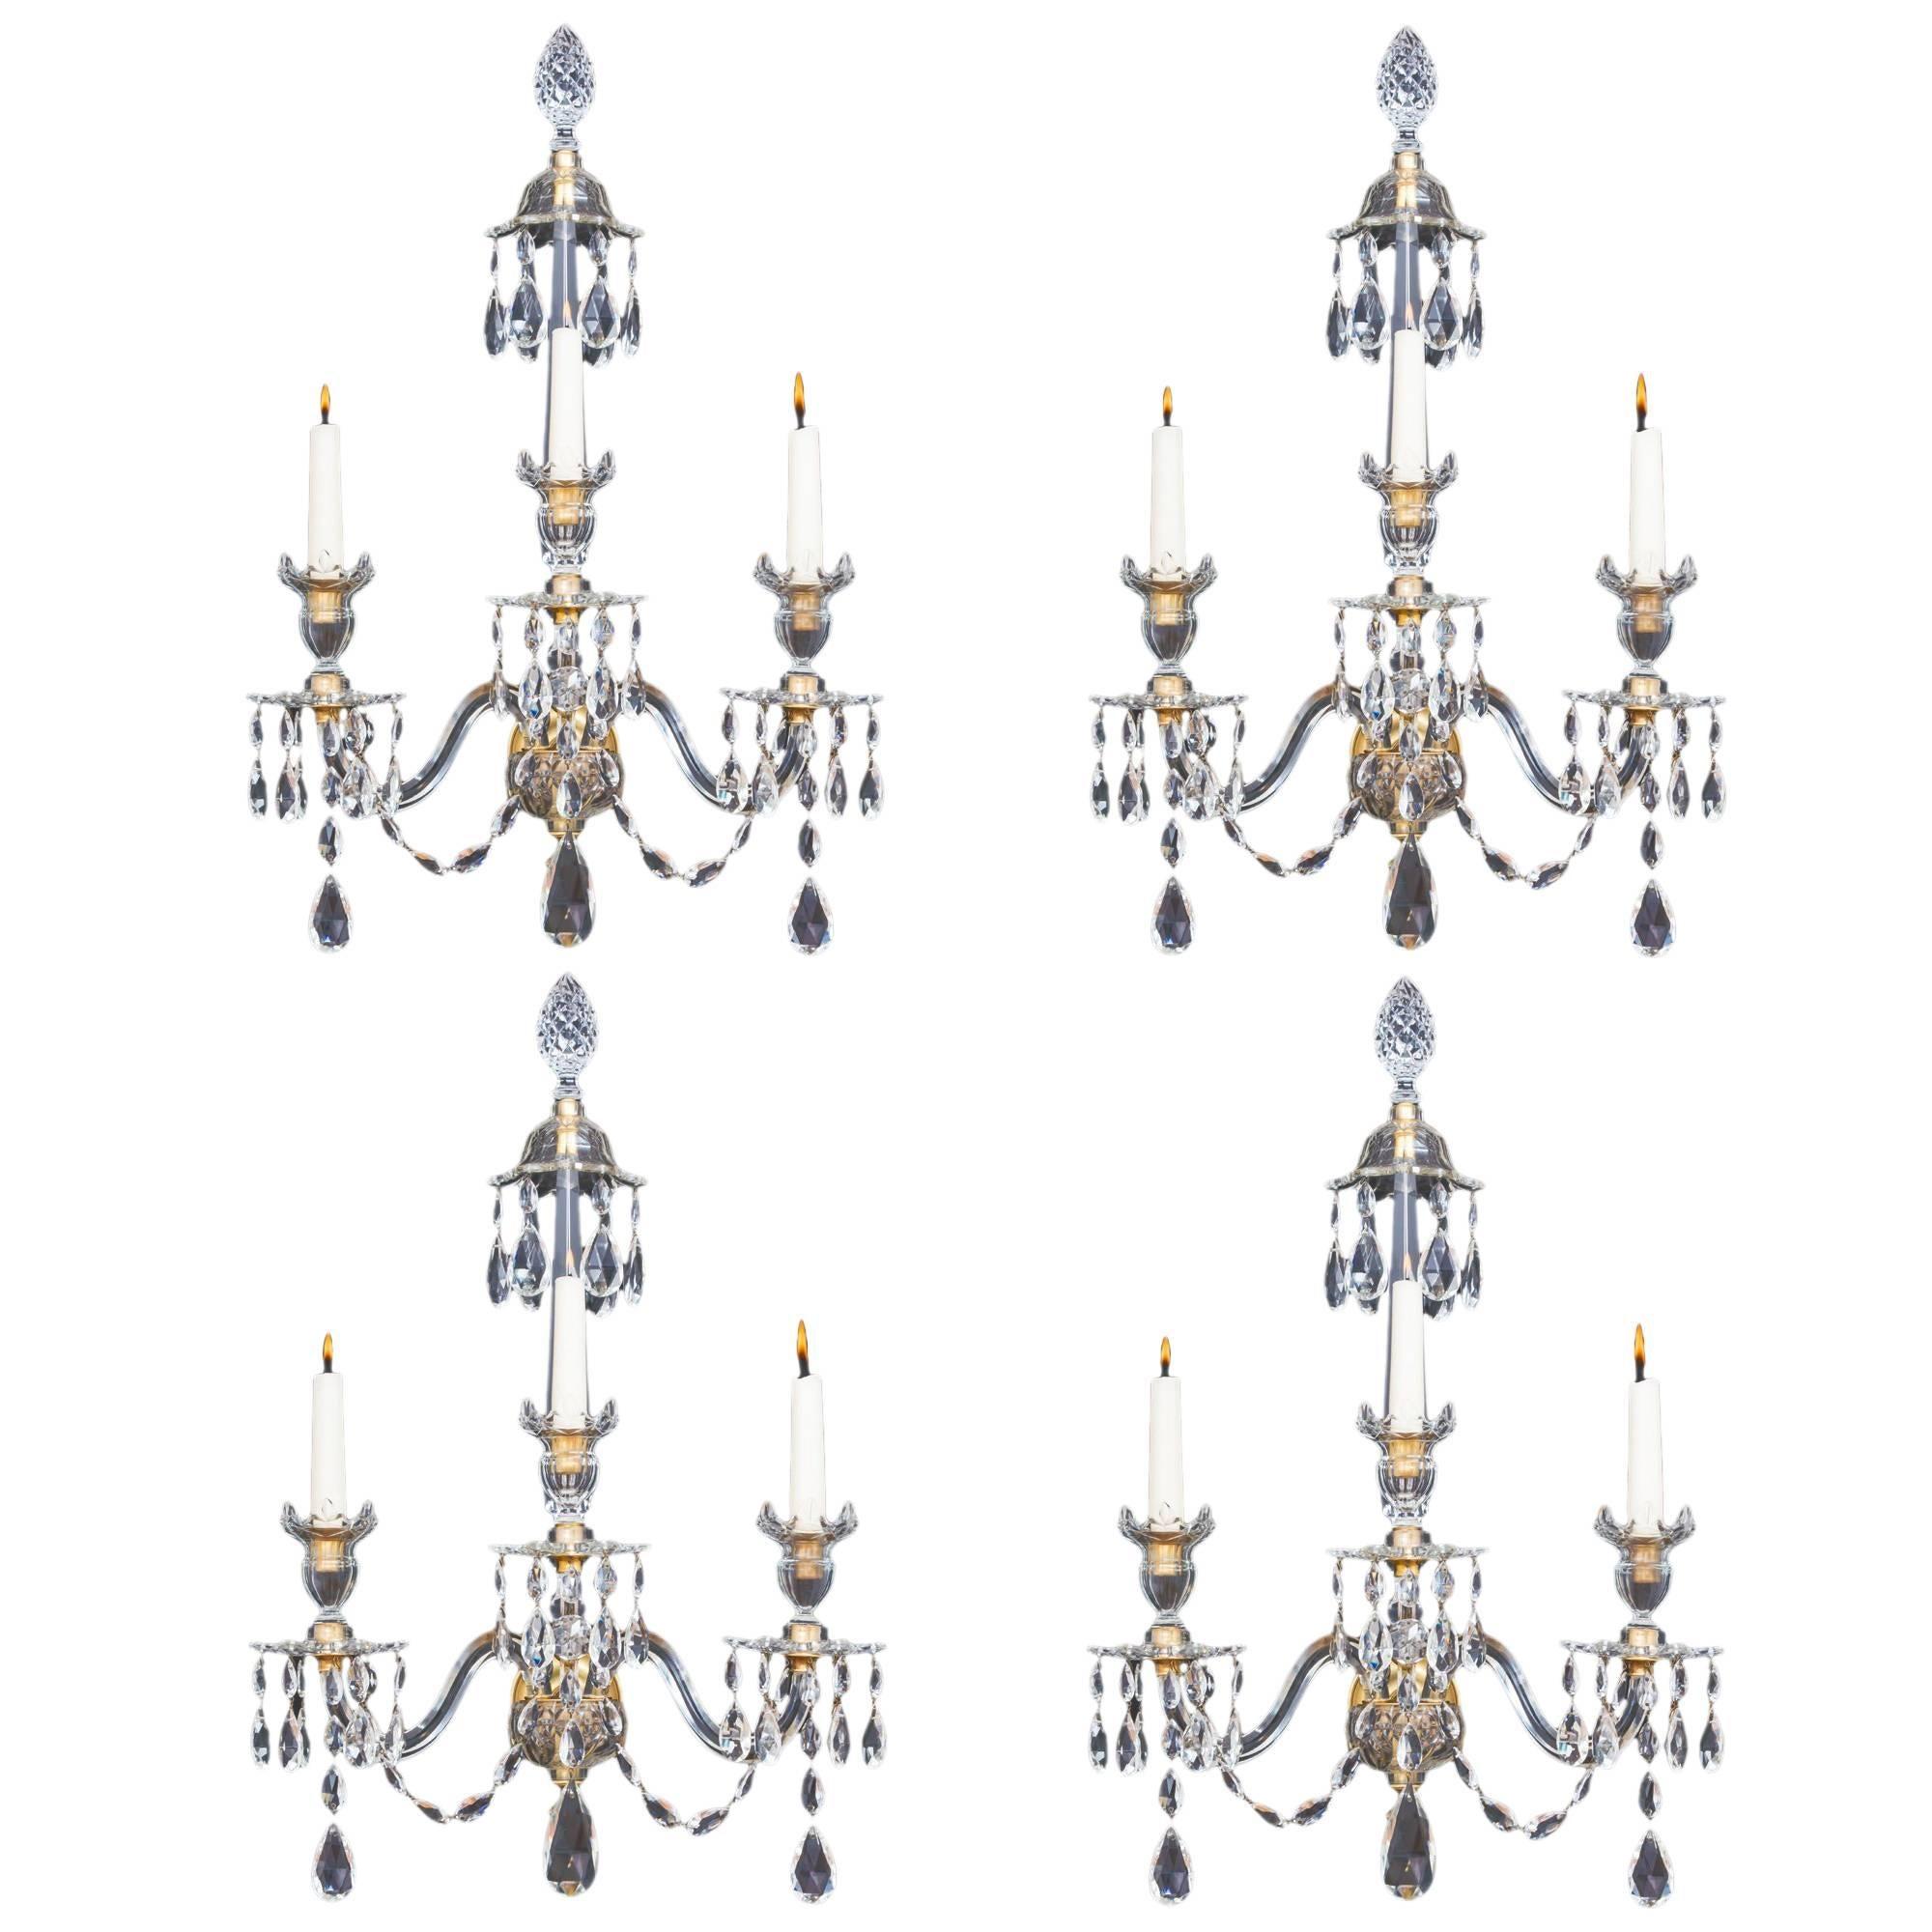 Set of Four Ormolu Mounted Cut Glass Wall Lights in Adam Style